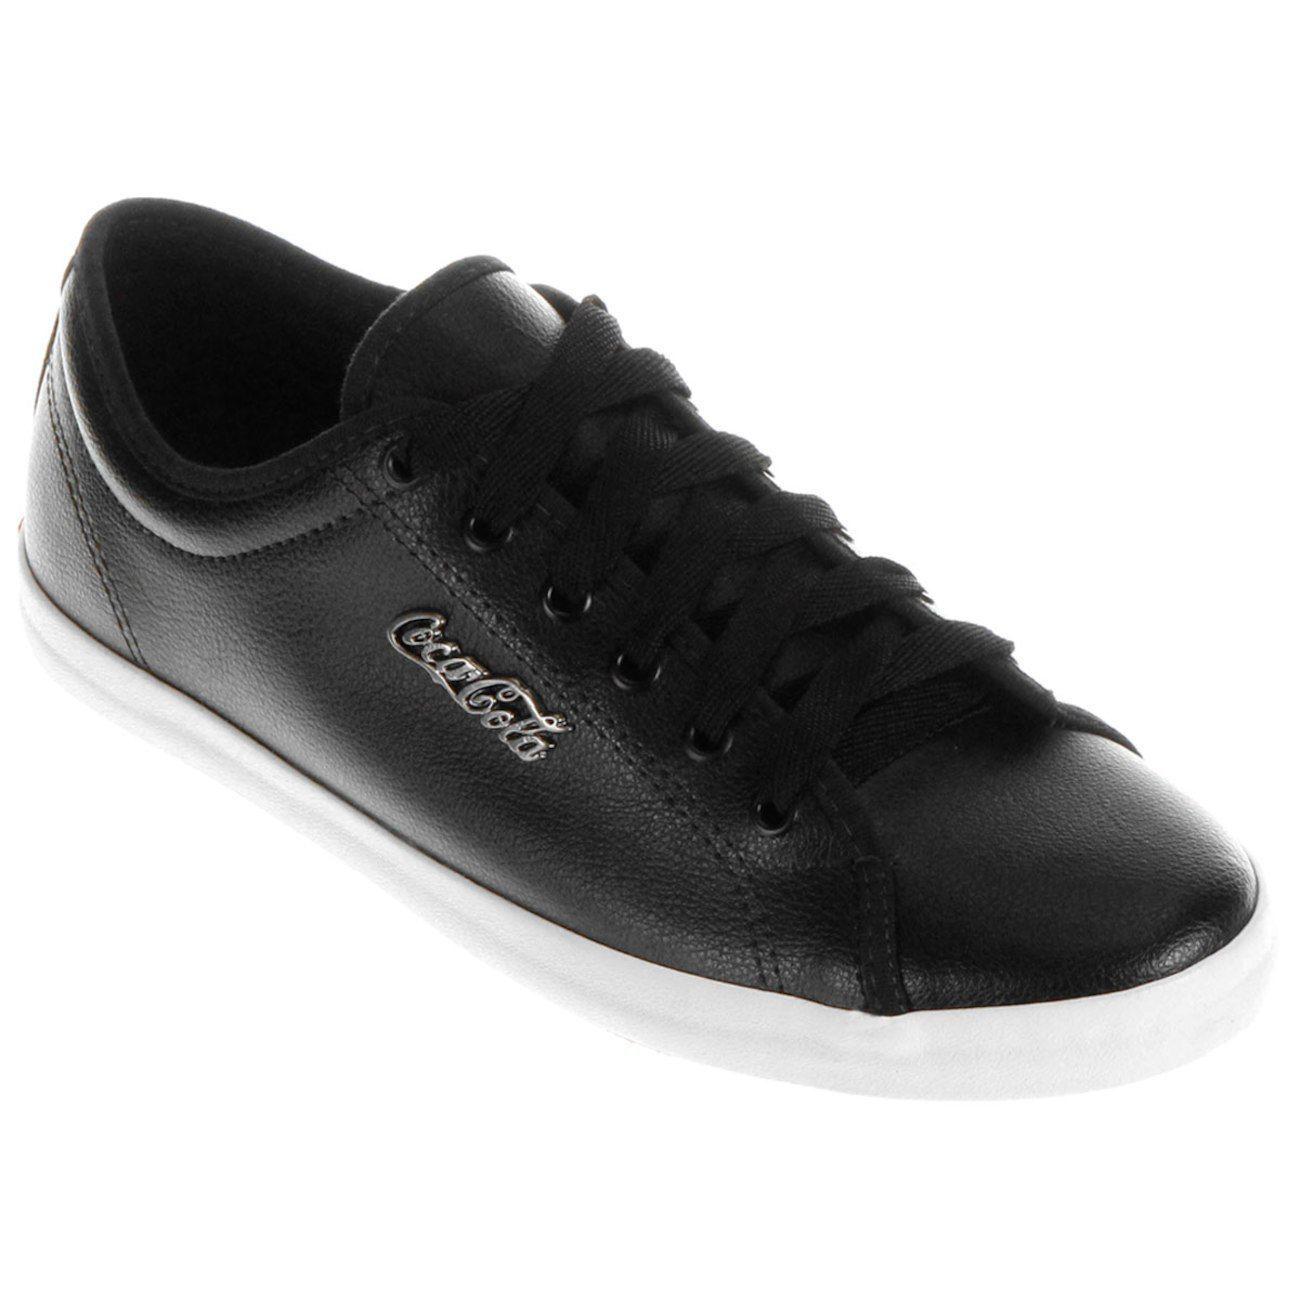 Sapatênis Coca-Cola Shoes Casual Confort Marx CC0800 Masc Ad